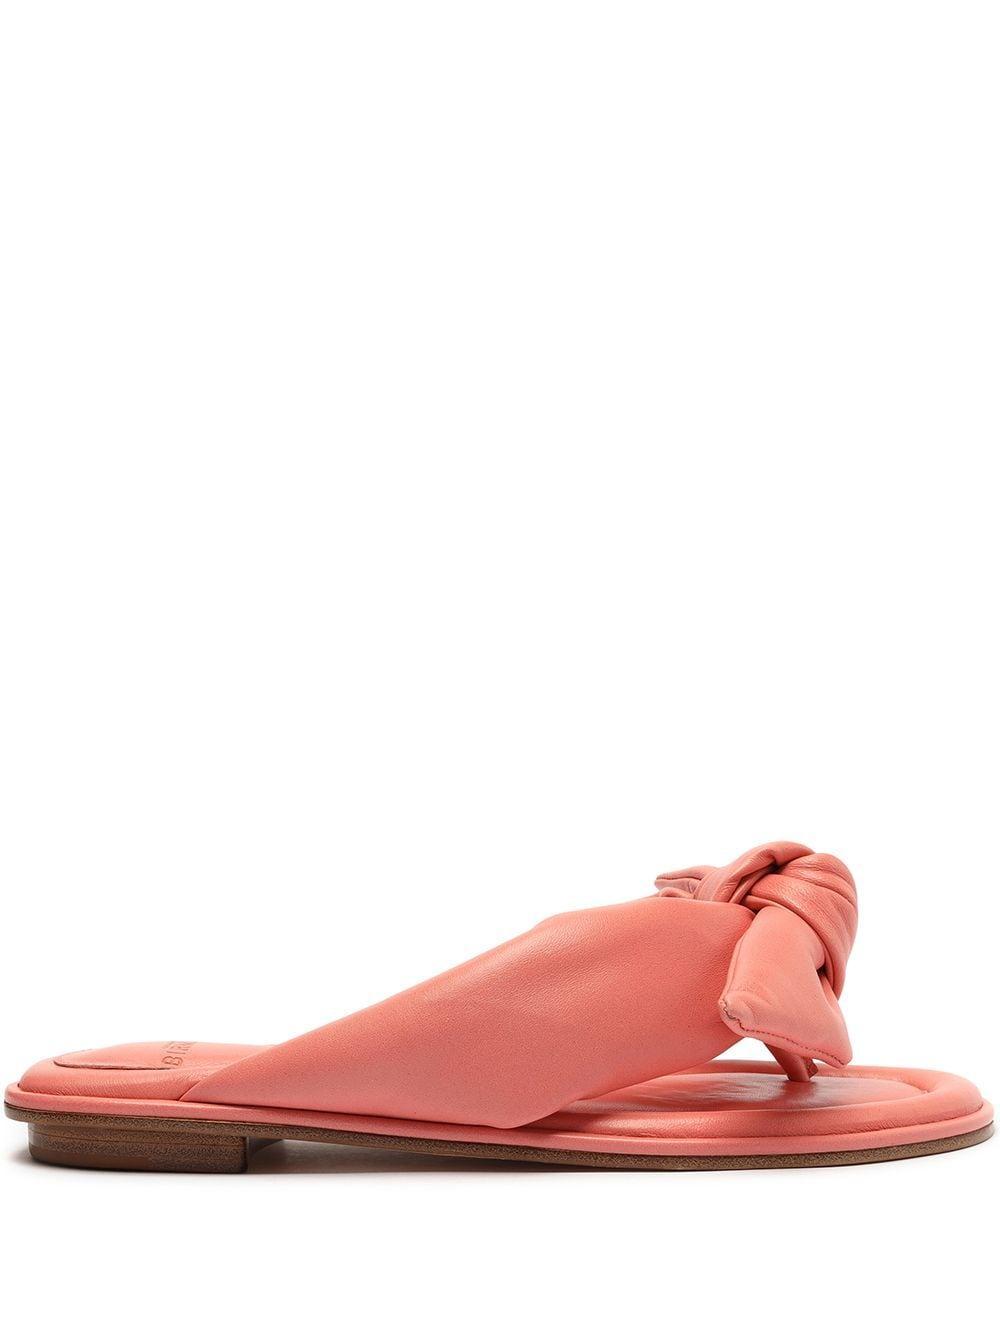 Soft Clarita Flat Sandal Item # B3541800010015